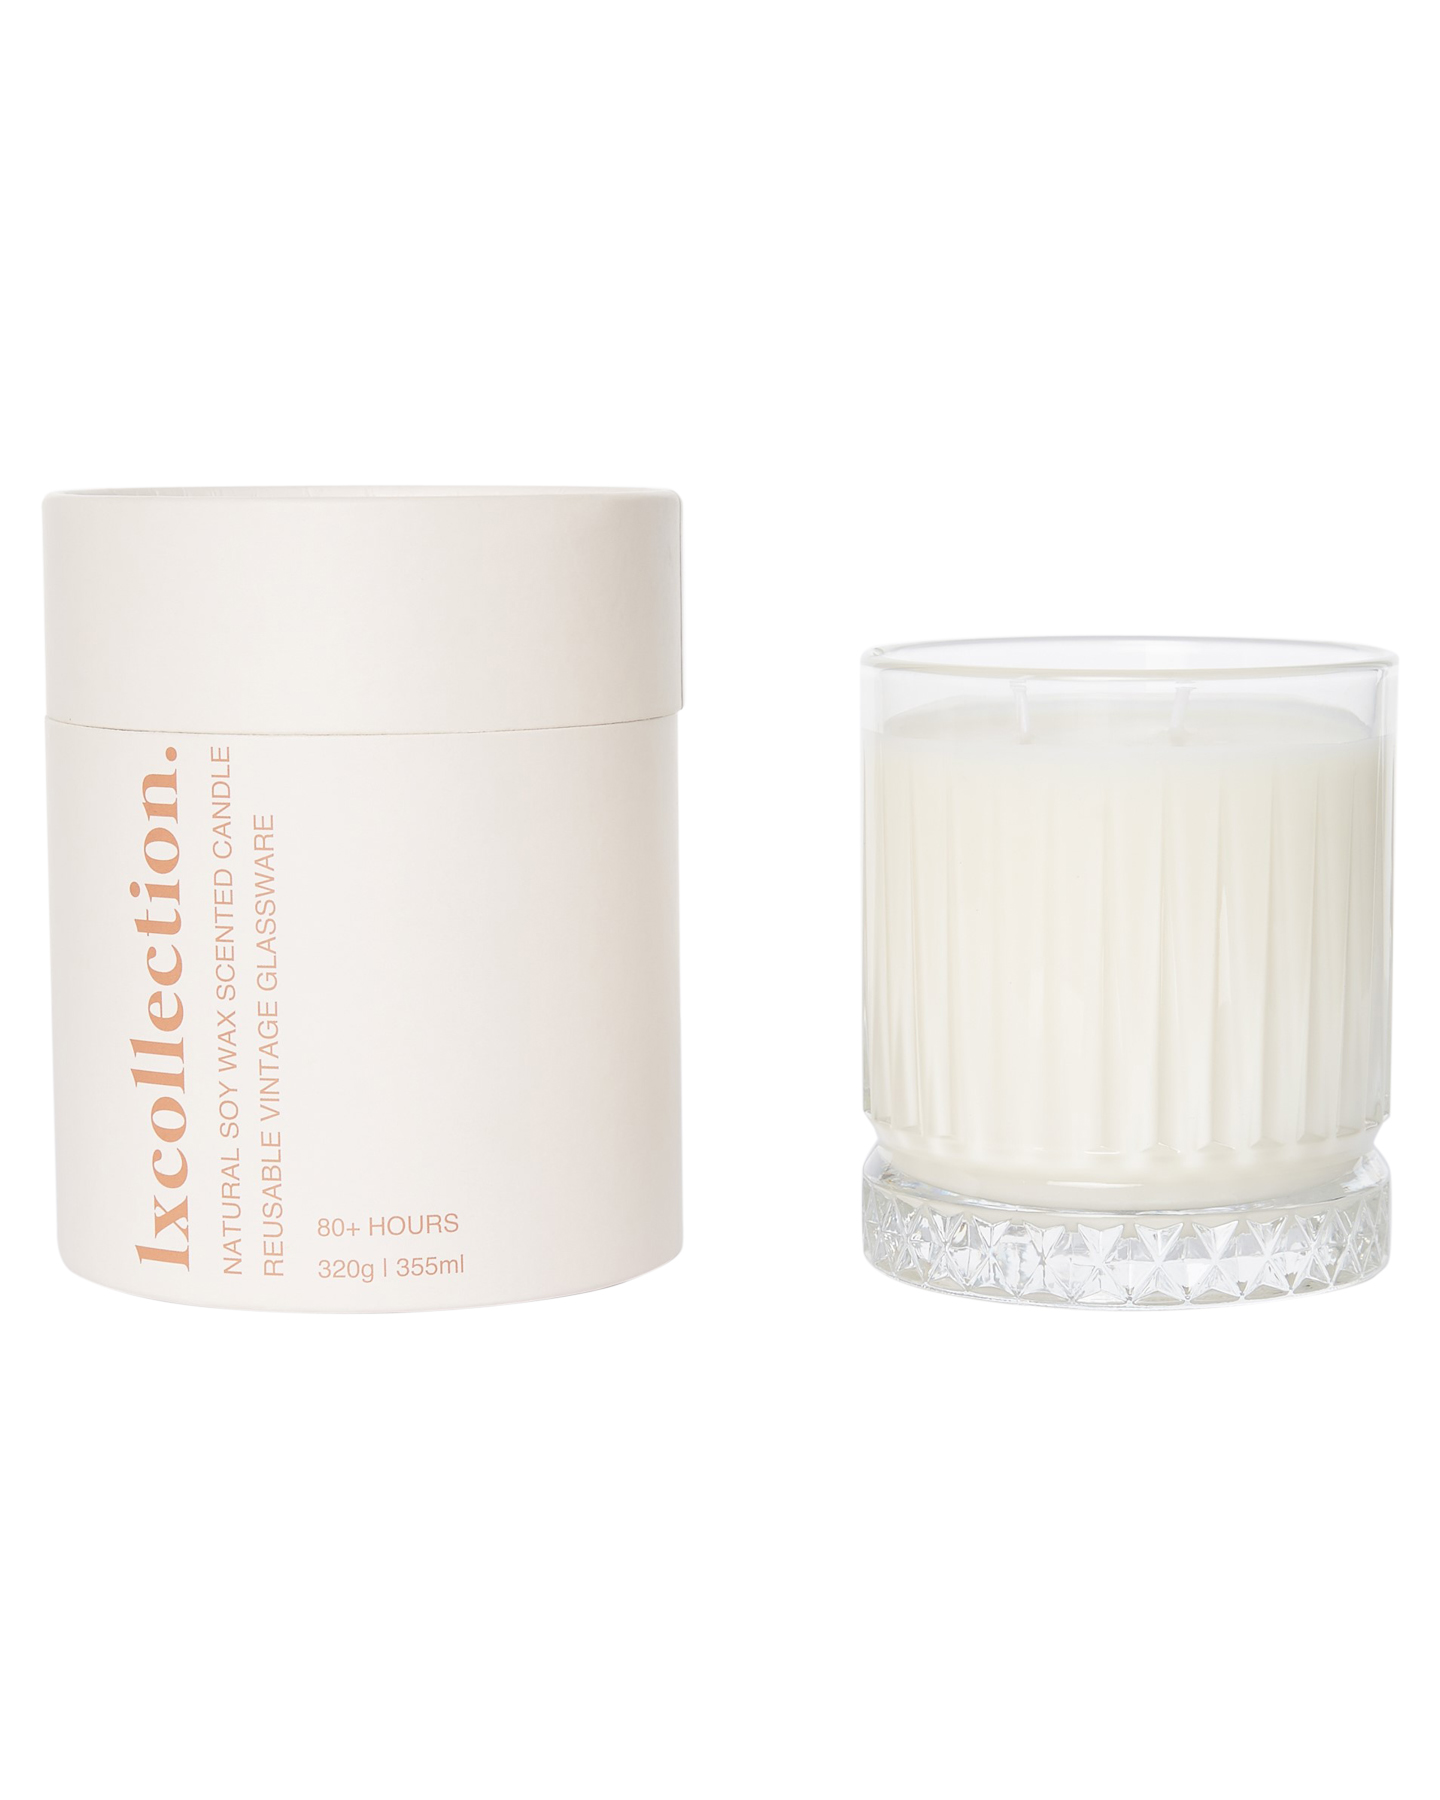 Lx Collection Sea Salt Caramel Vanilla & Hazelnut Candle Natural